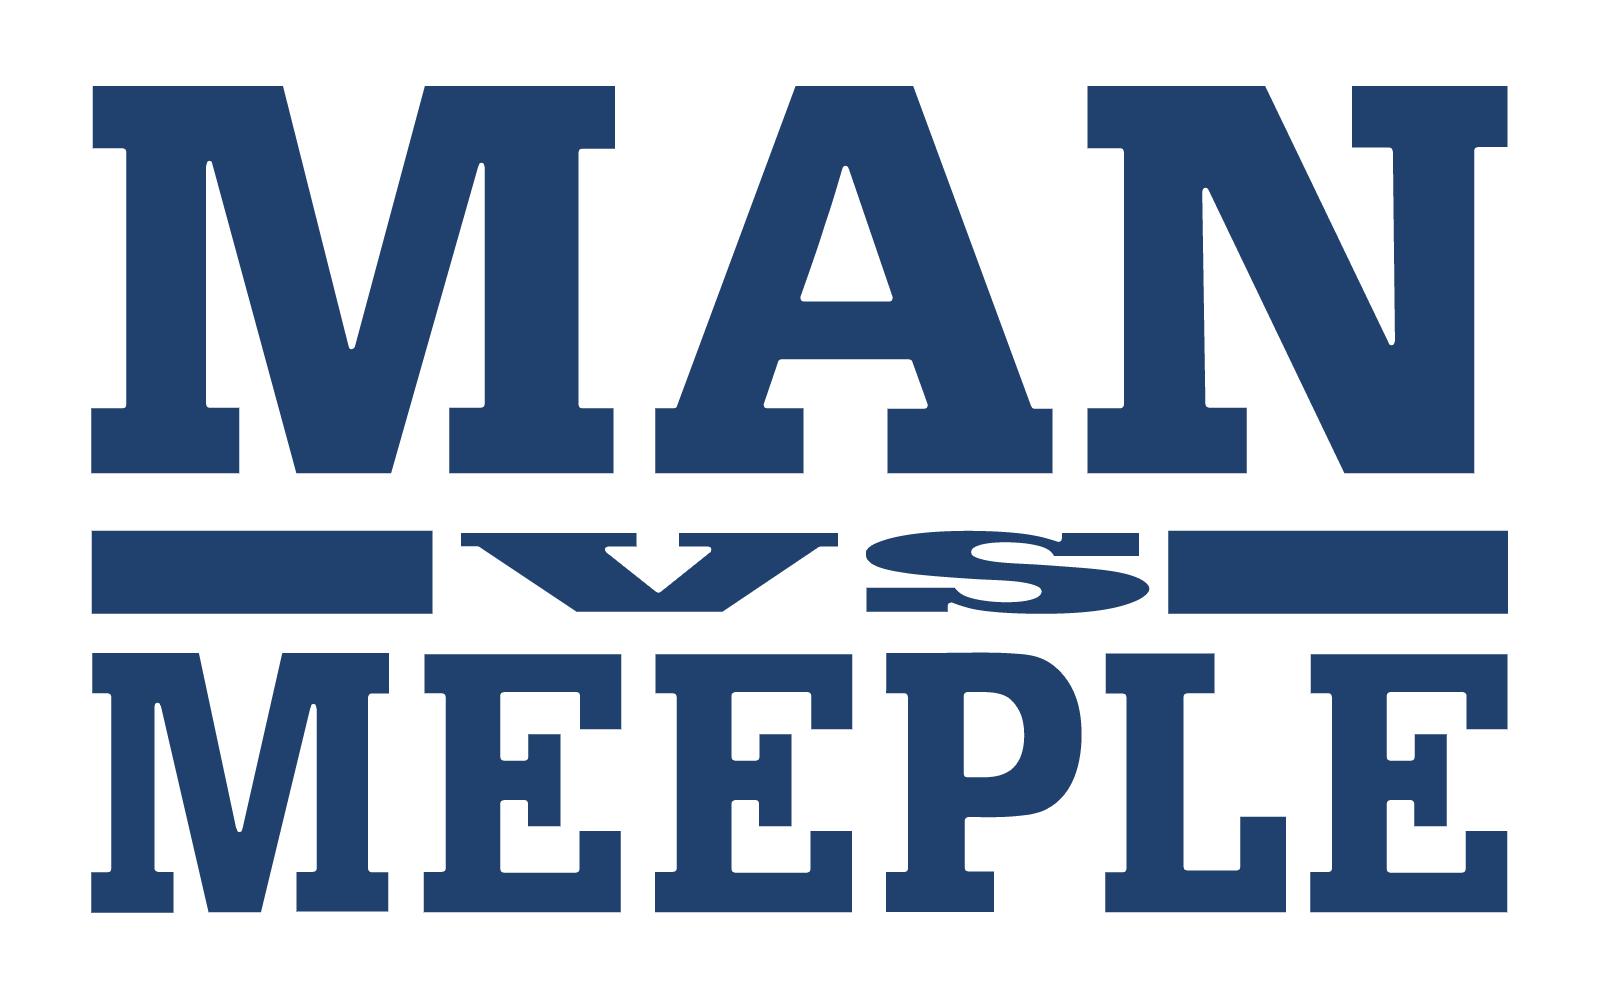 ManvsMeepleLogo.png